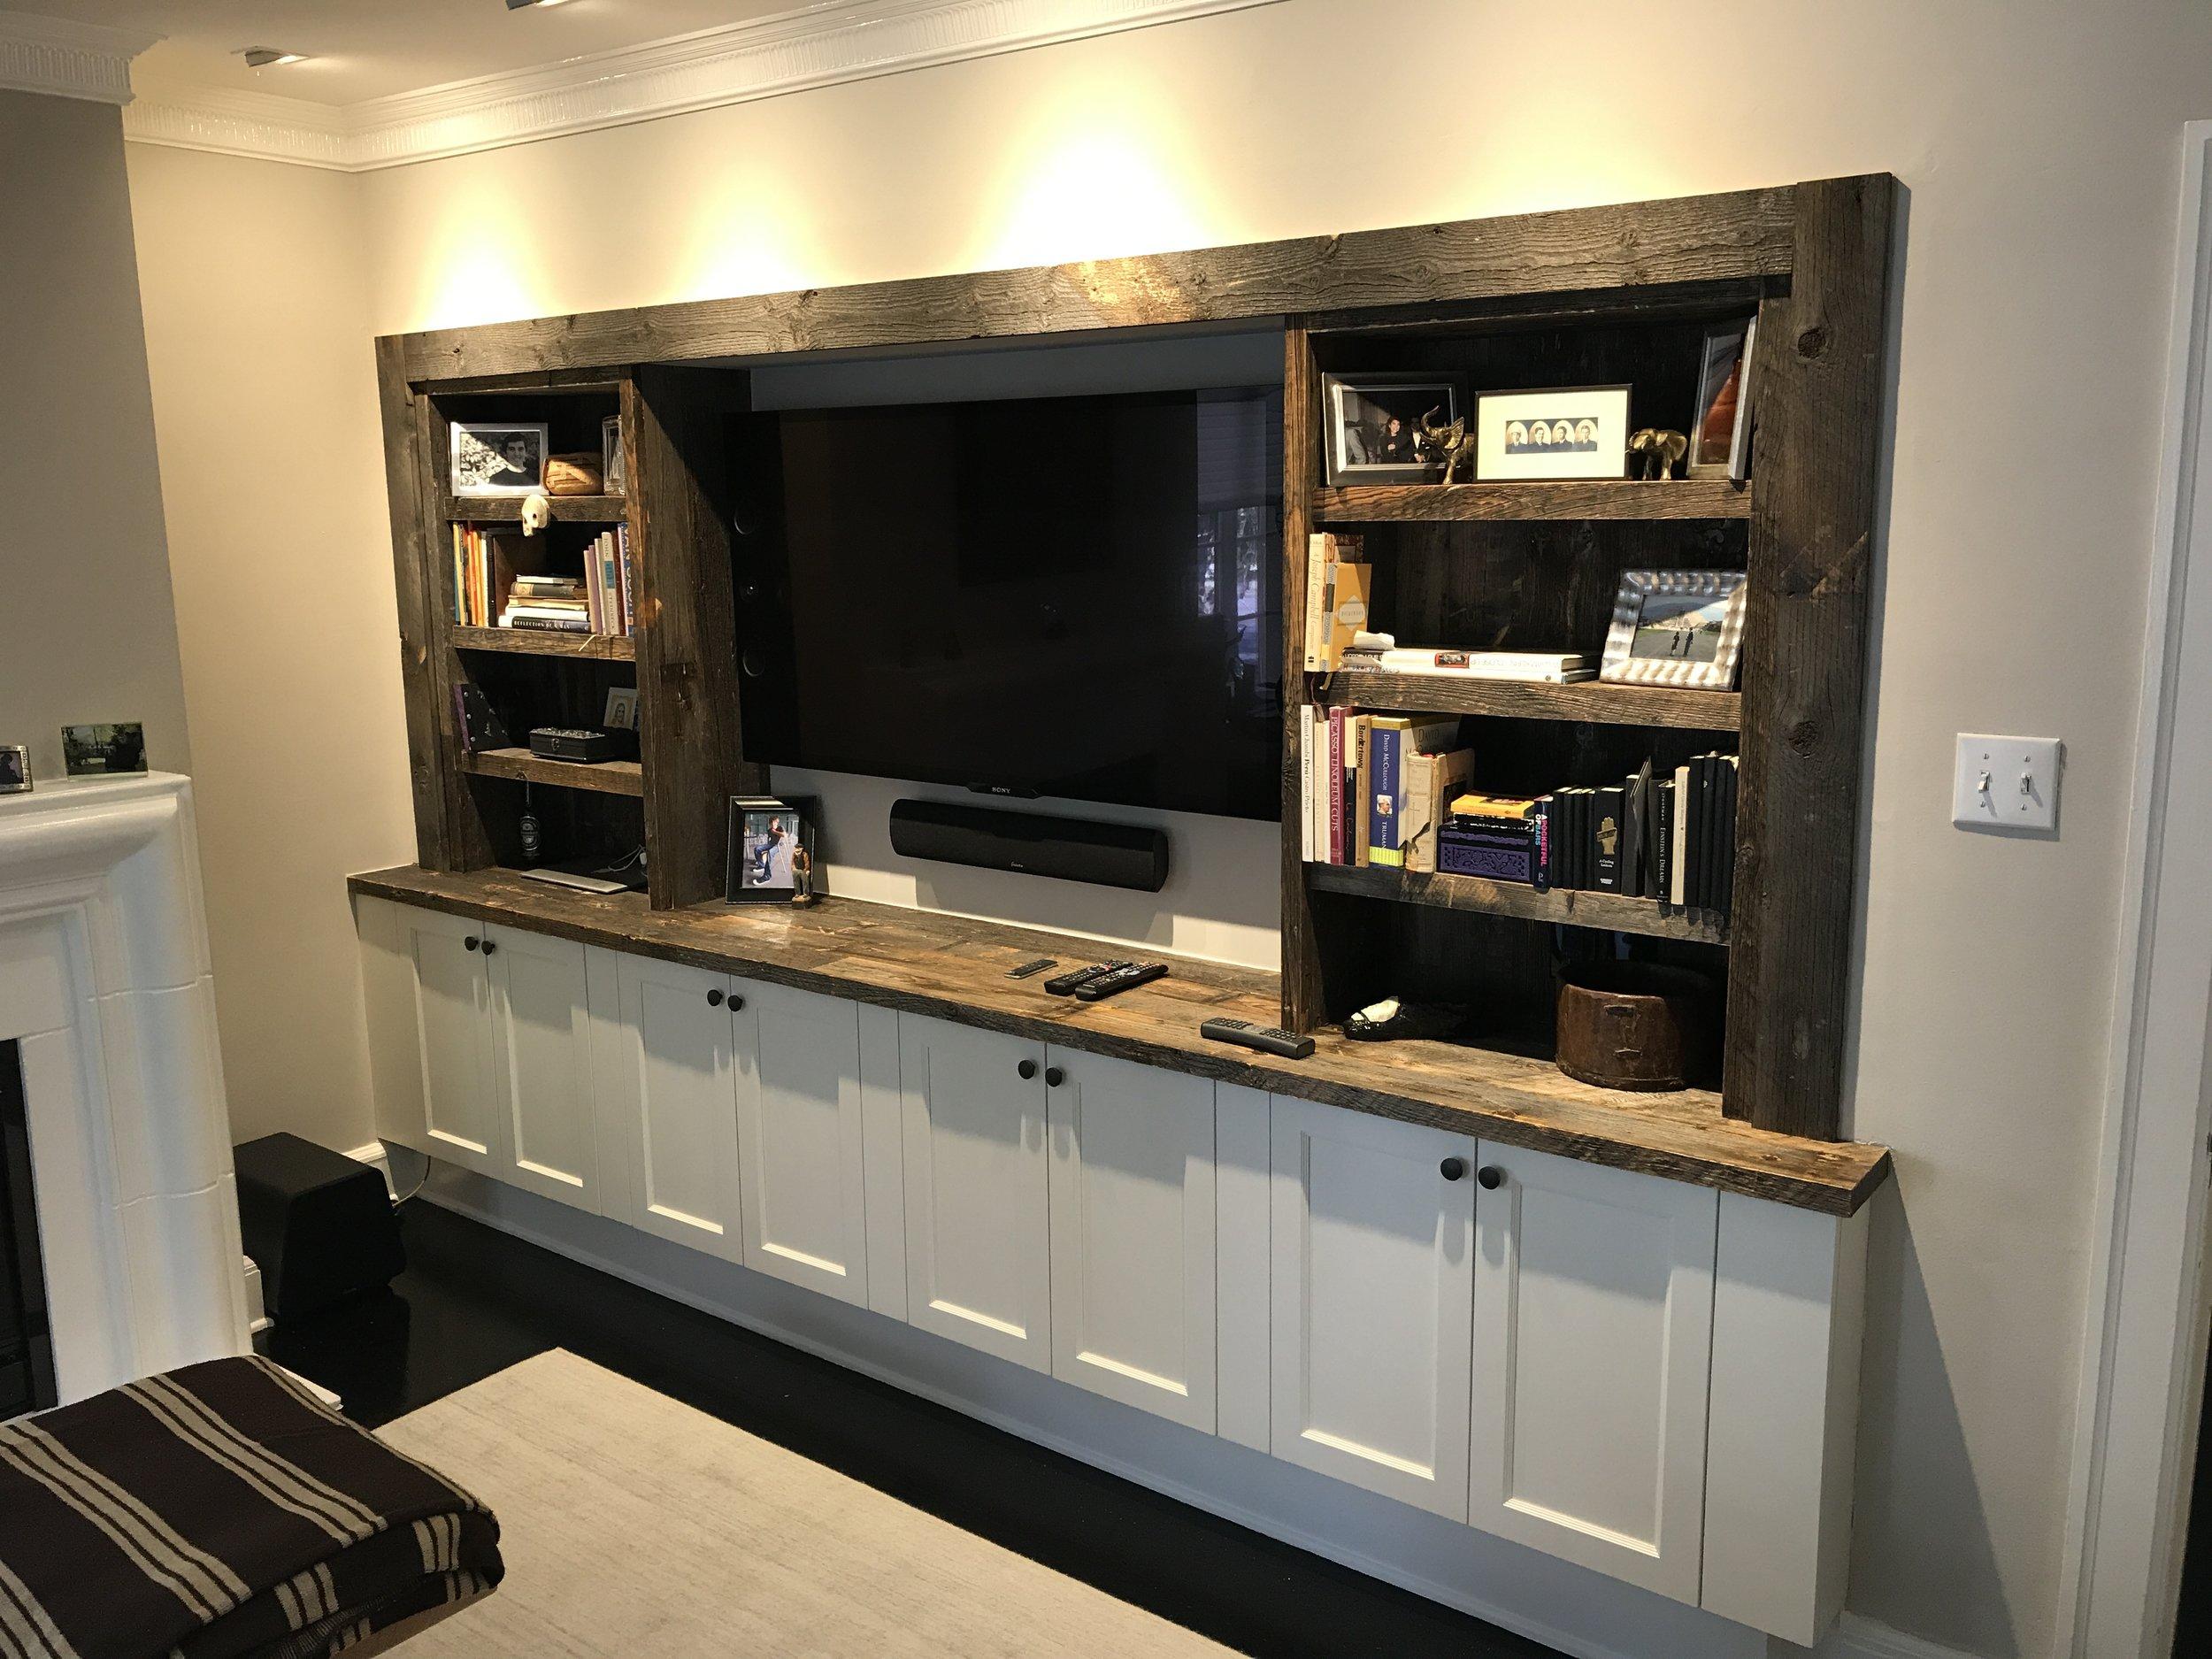 cabinetry.JPG